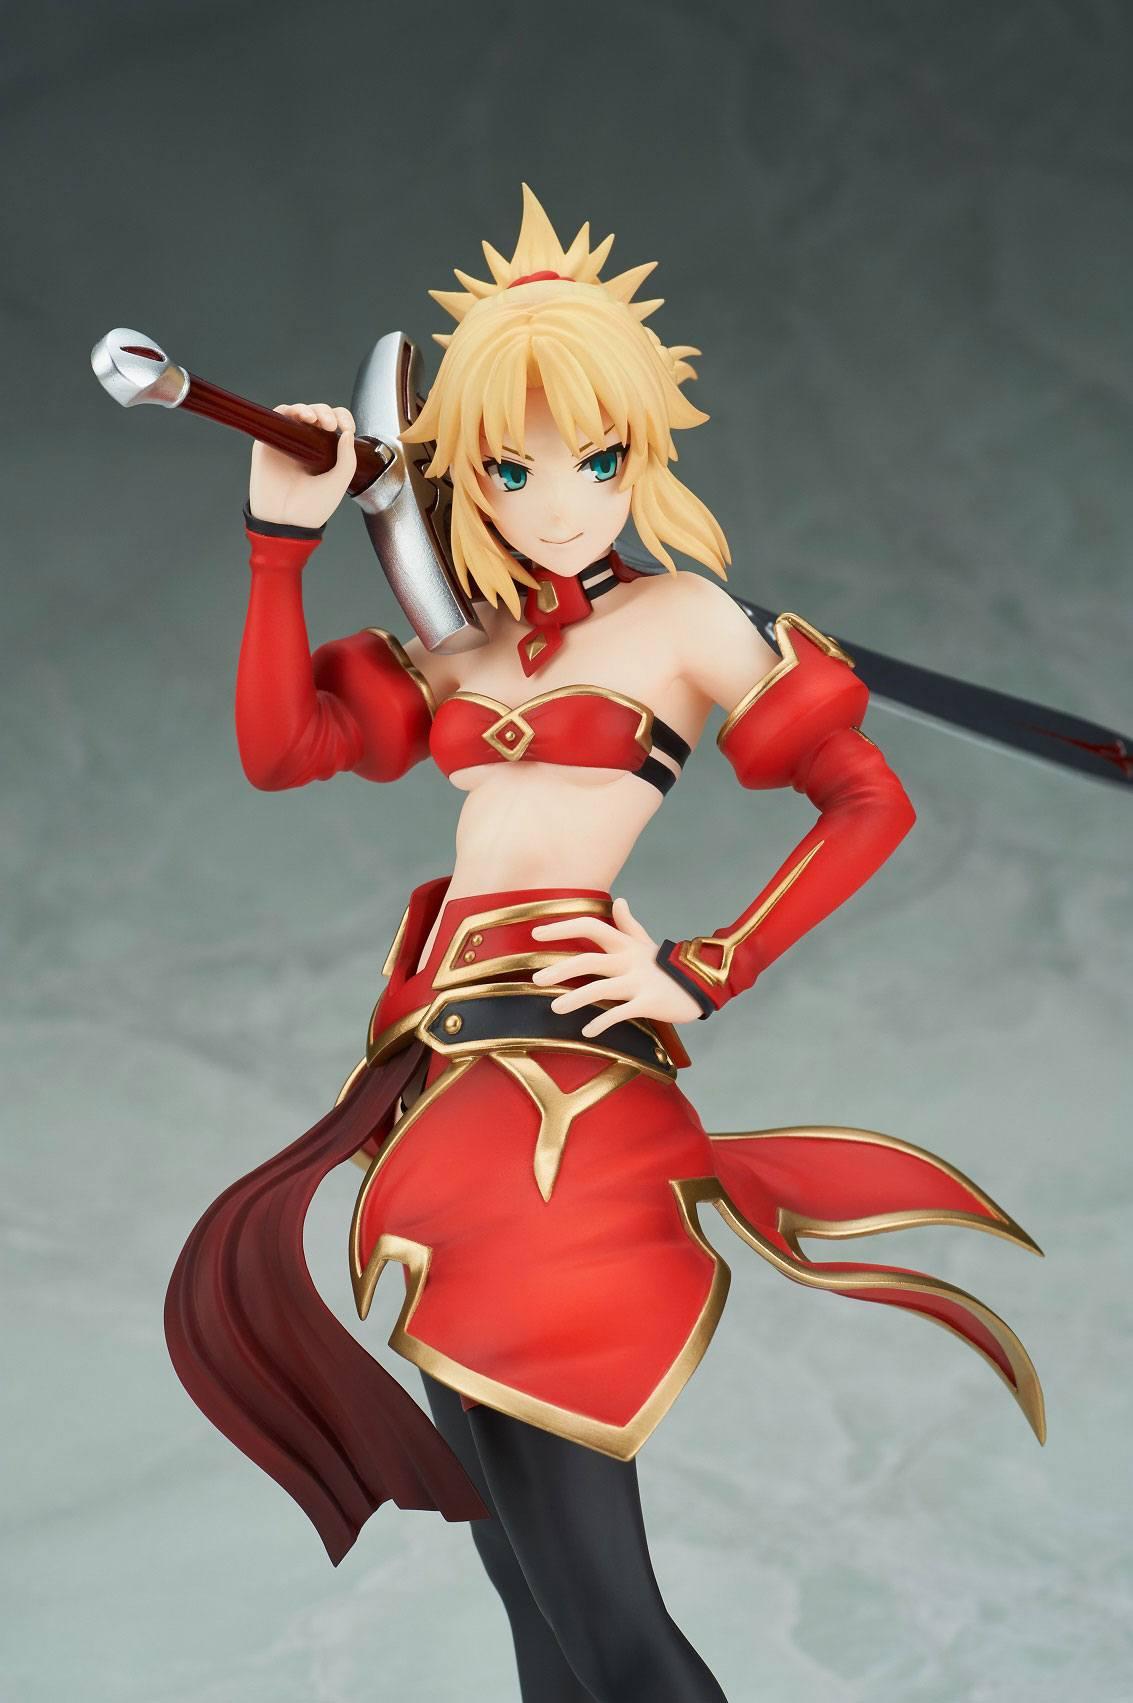 Fate/Grand Order Statue 1/7 Saber / Mordred 23 cm - Animegami Store